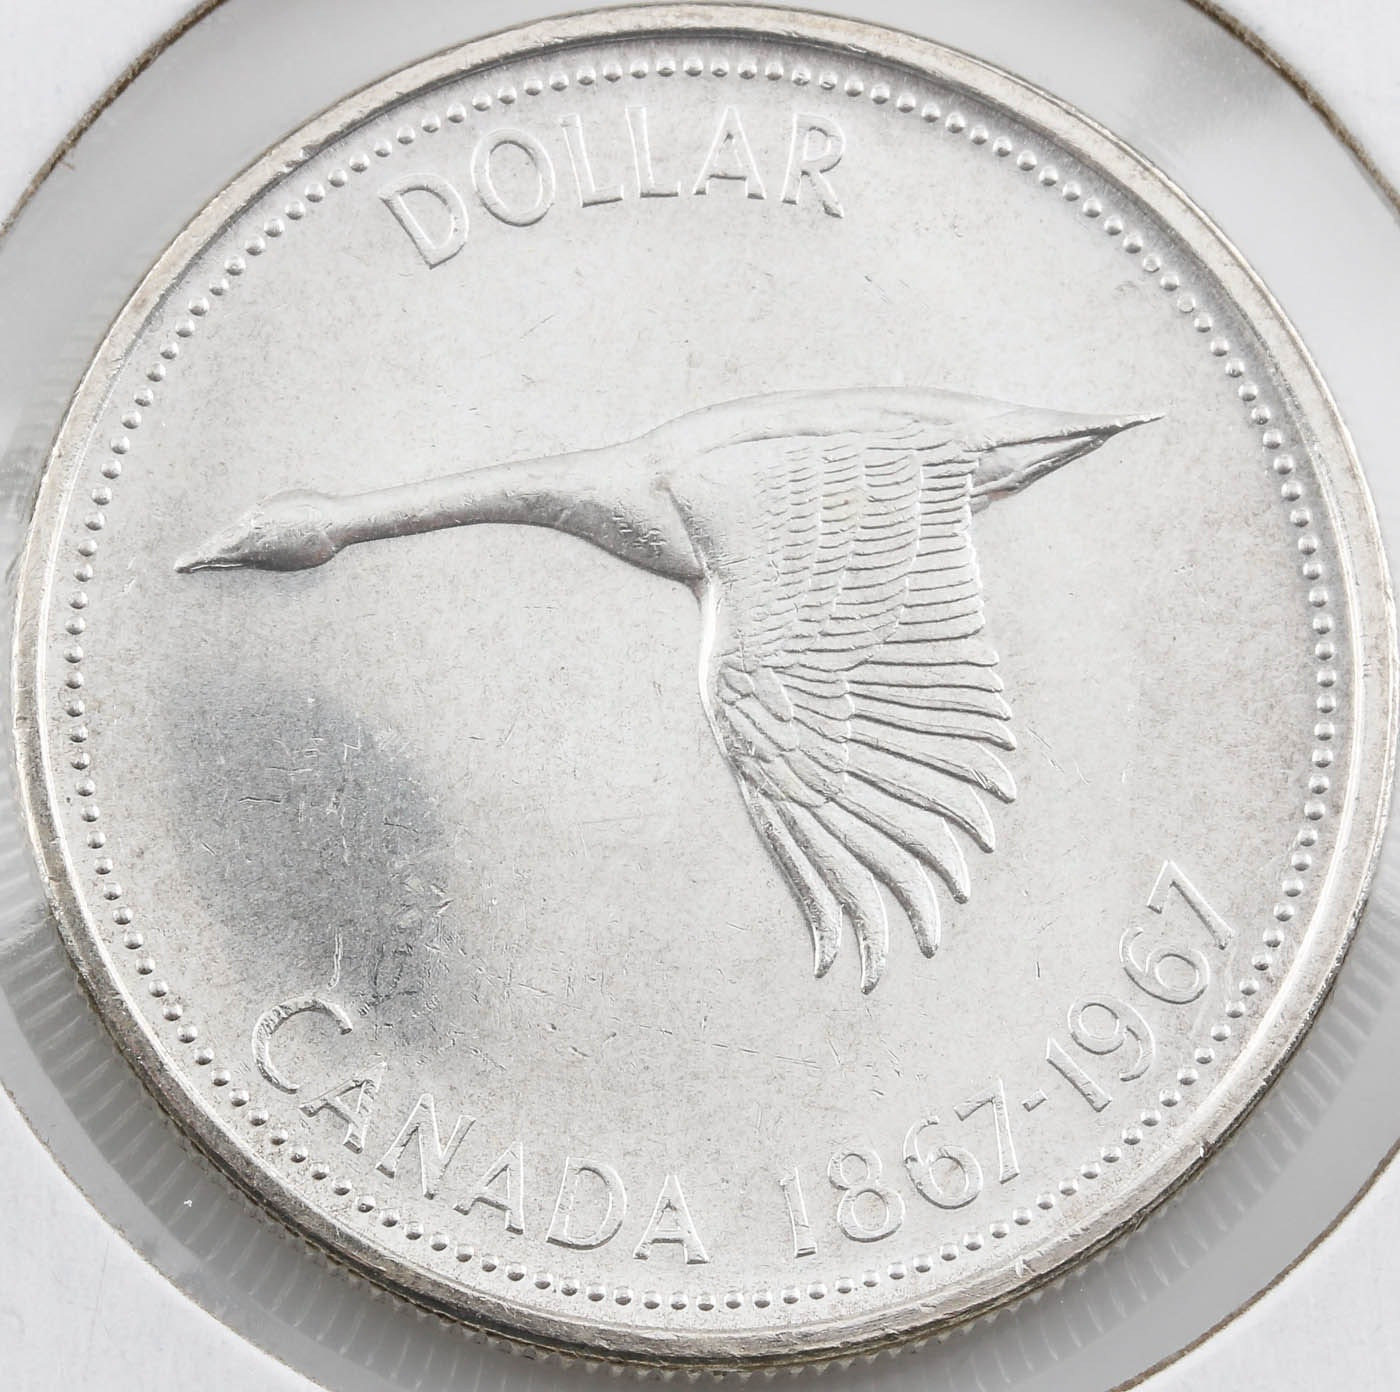 1967 Canadian Silver Dollar 100 Year Commemorative